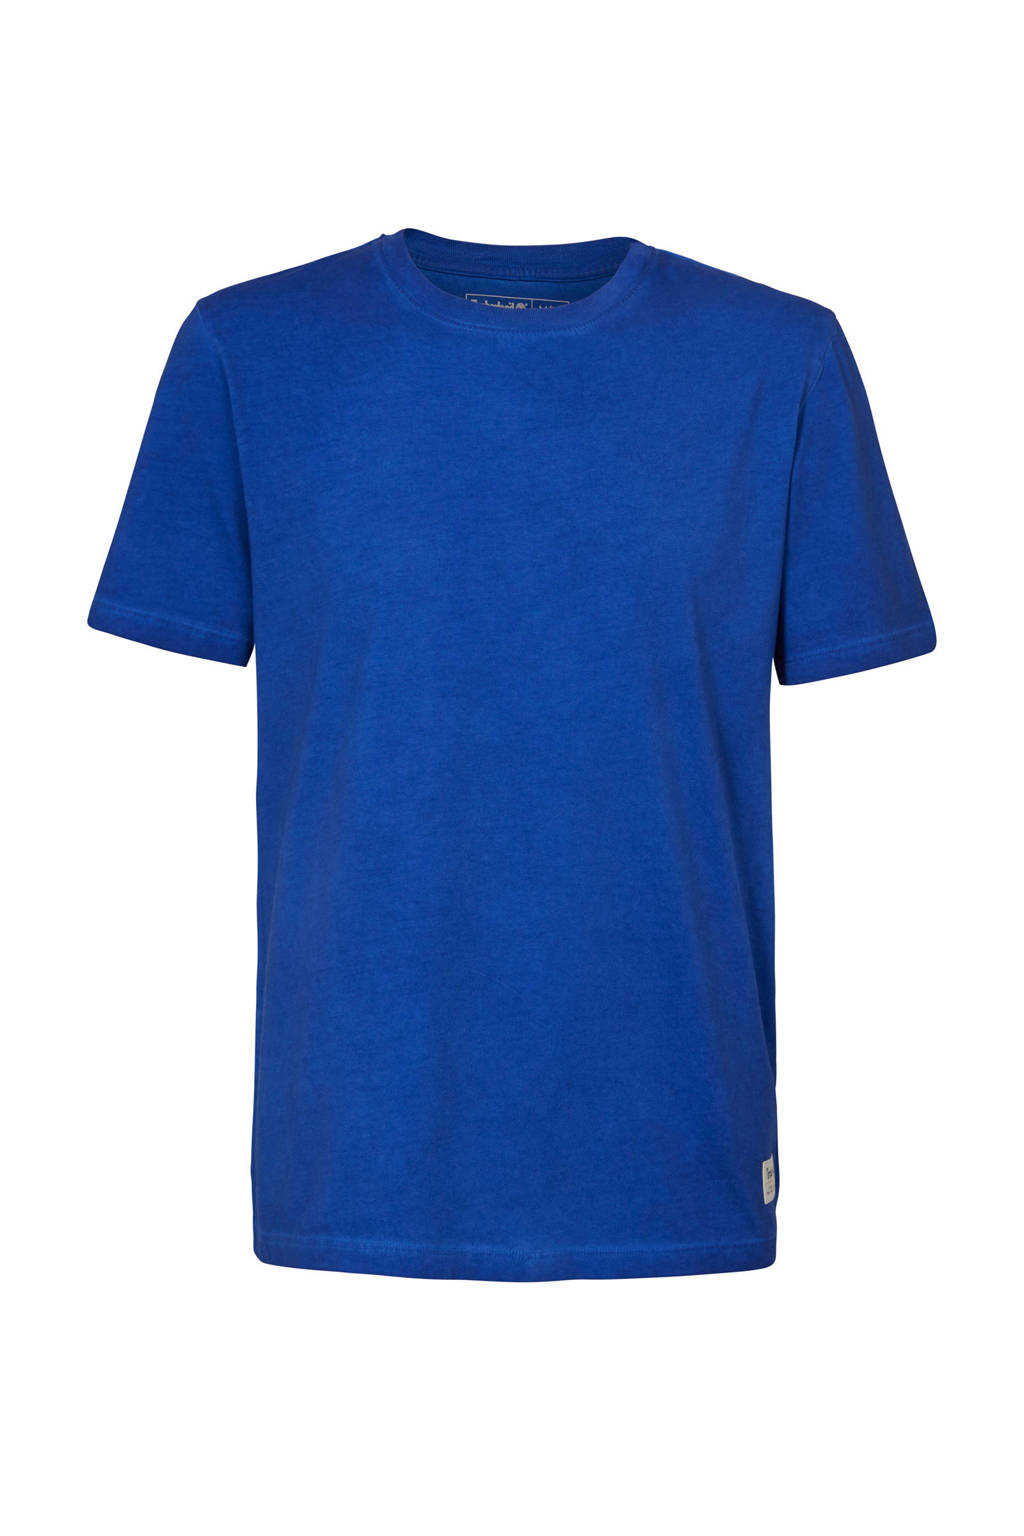 Timberland T-shirt kobalt, Kobalt